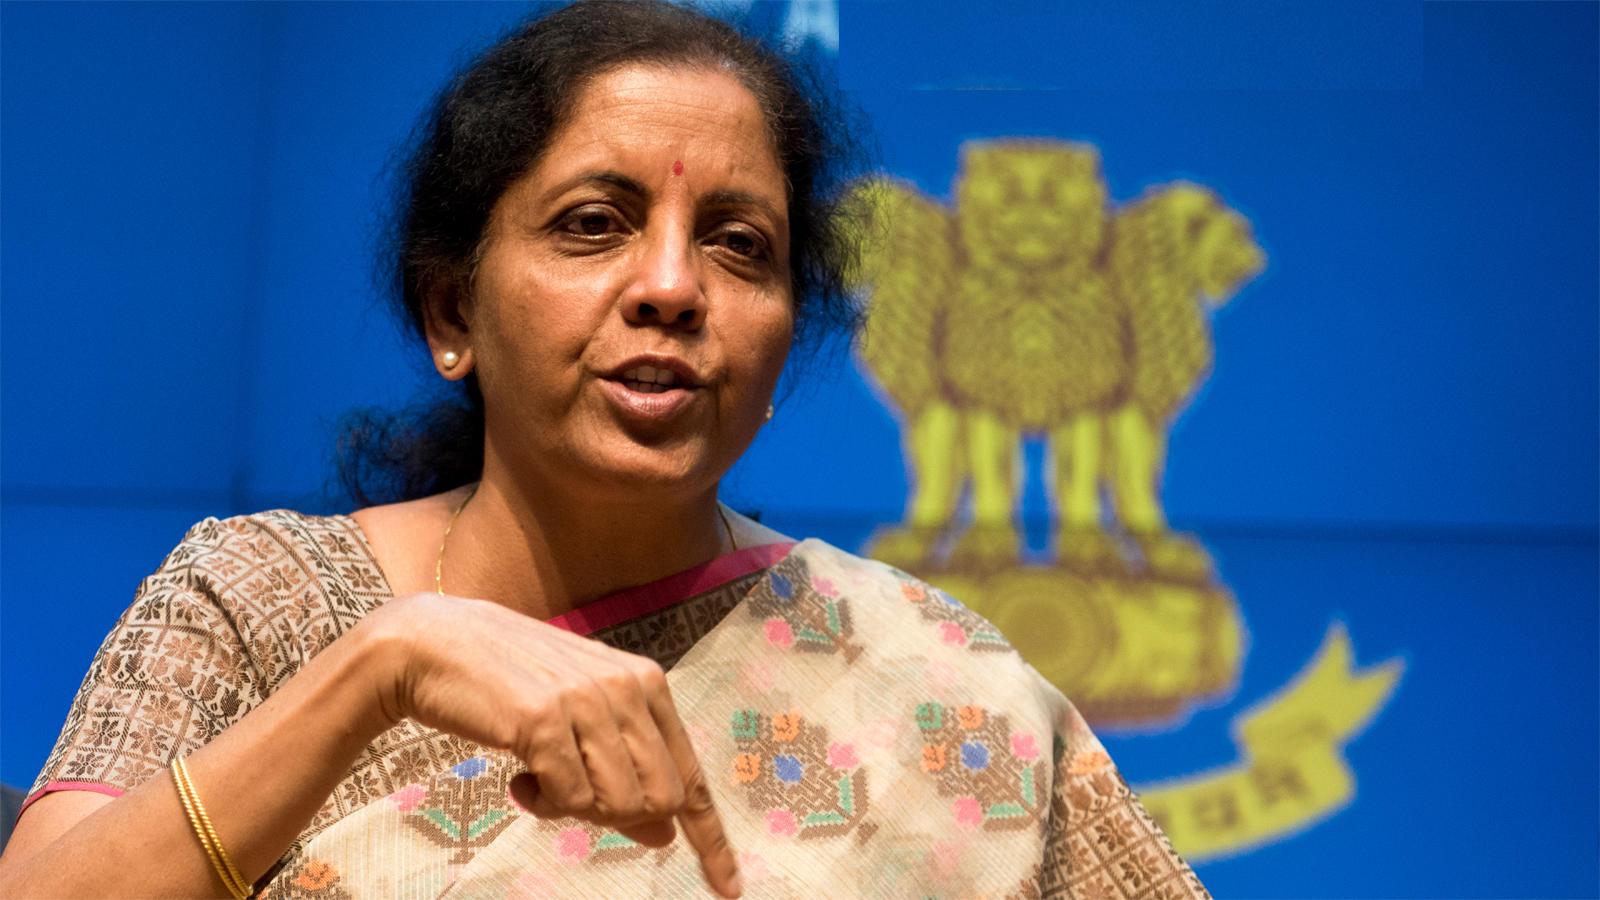 public-sector-banks-had-worst-phase-under-manmohan-singh-raghuram-rajan-fm-nirmala-sitharaman